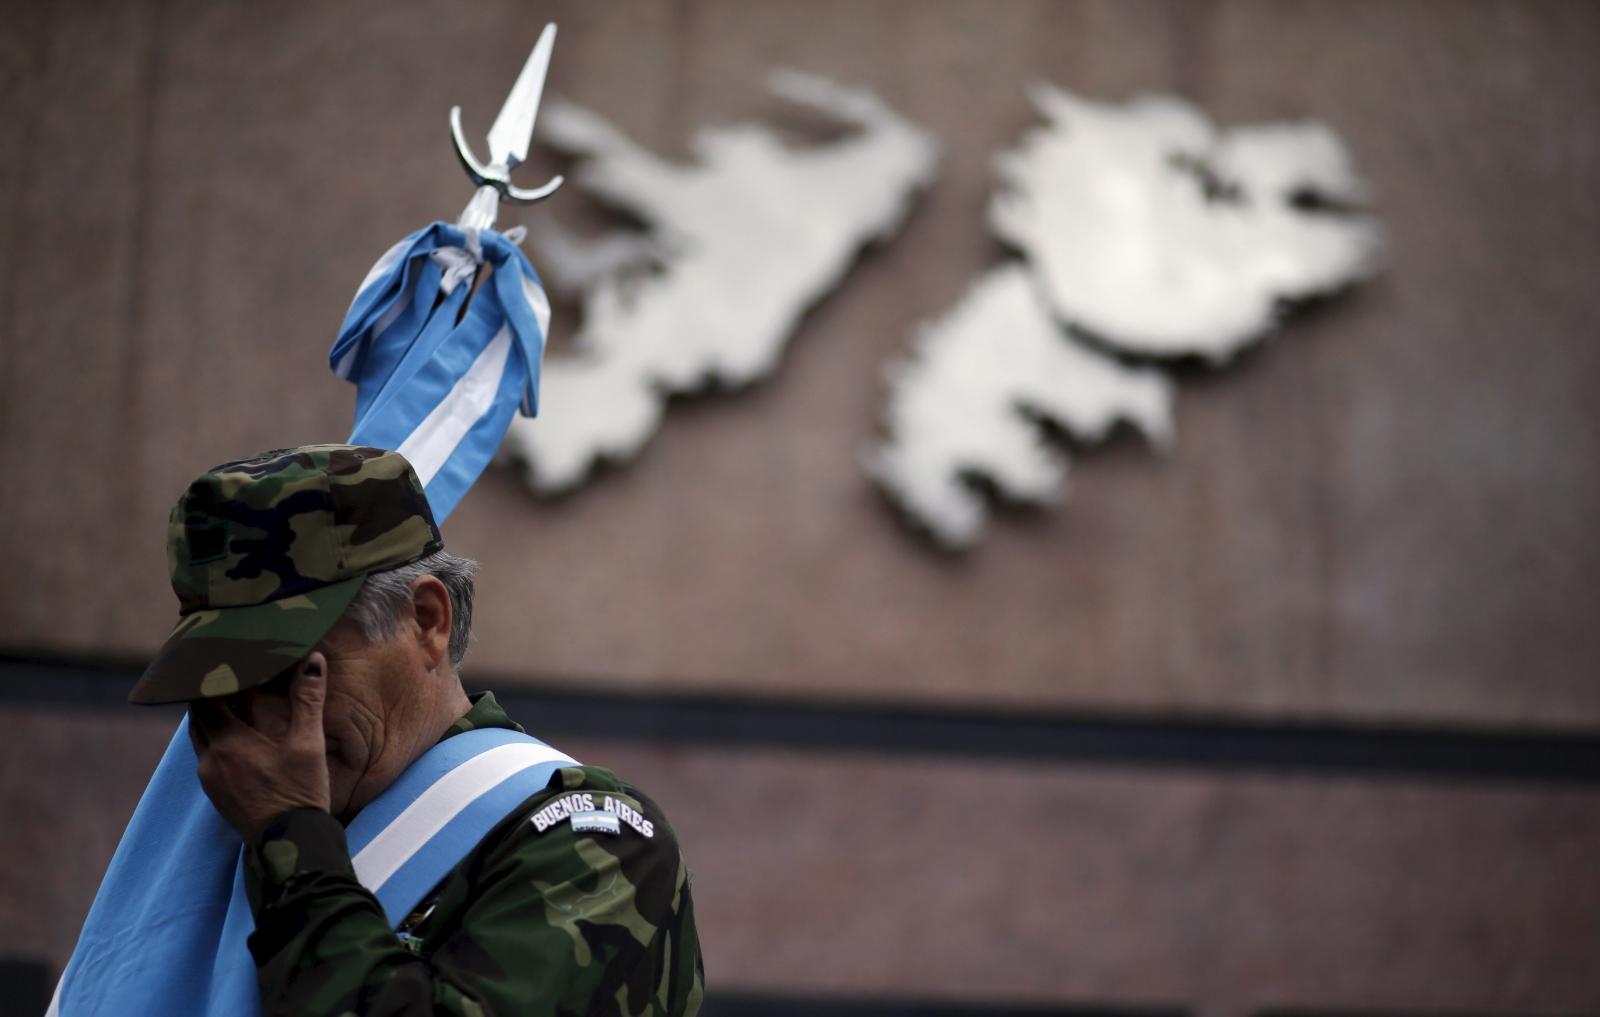 Falkland islands dispute veteran 2016